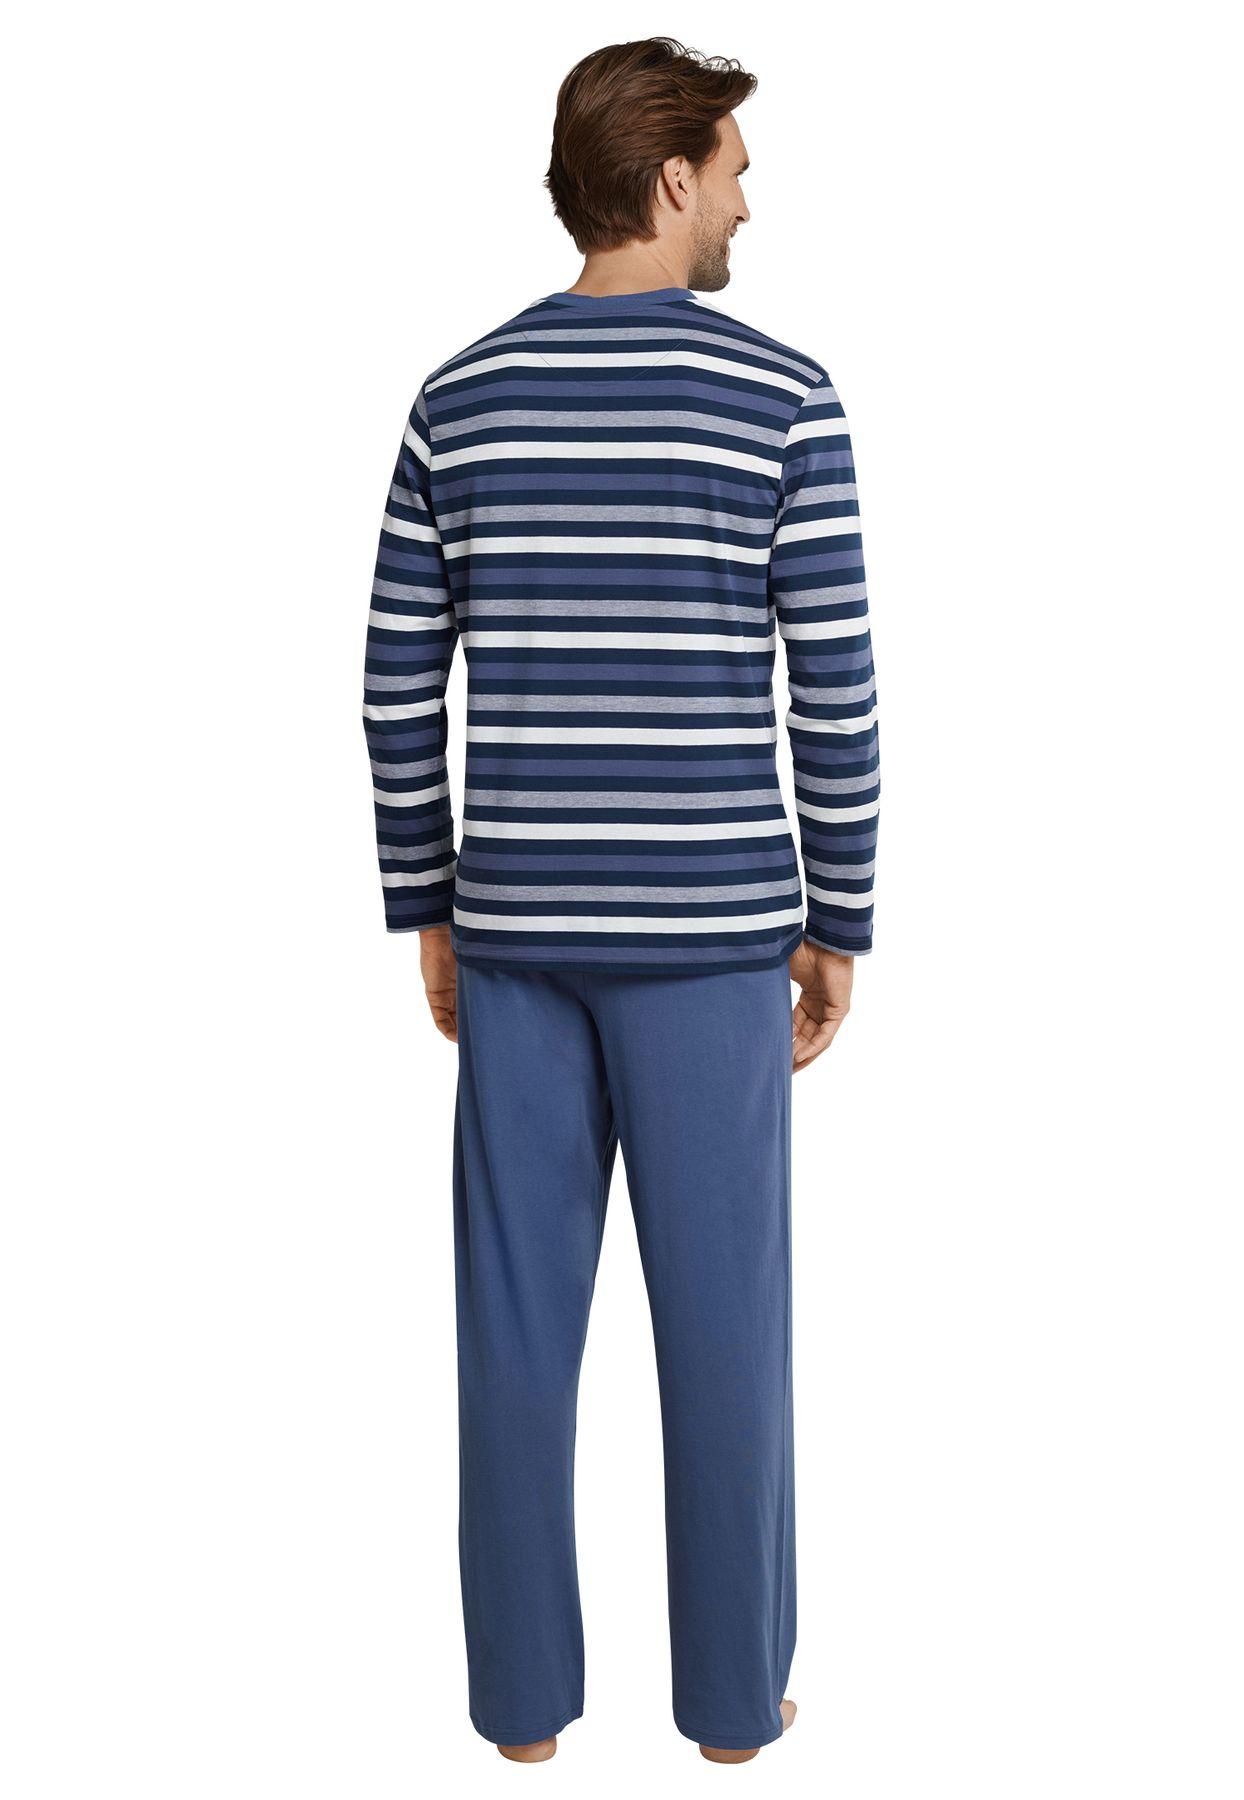 Seidensticker - Herren Pyjama lang, blau (161174) – Bild 2